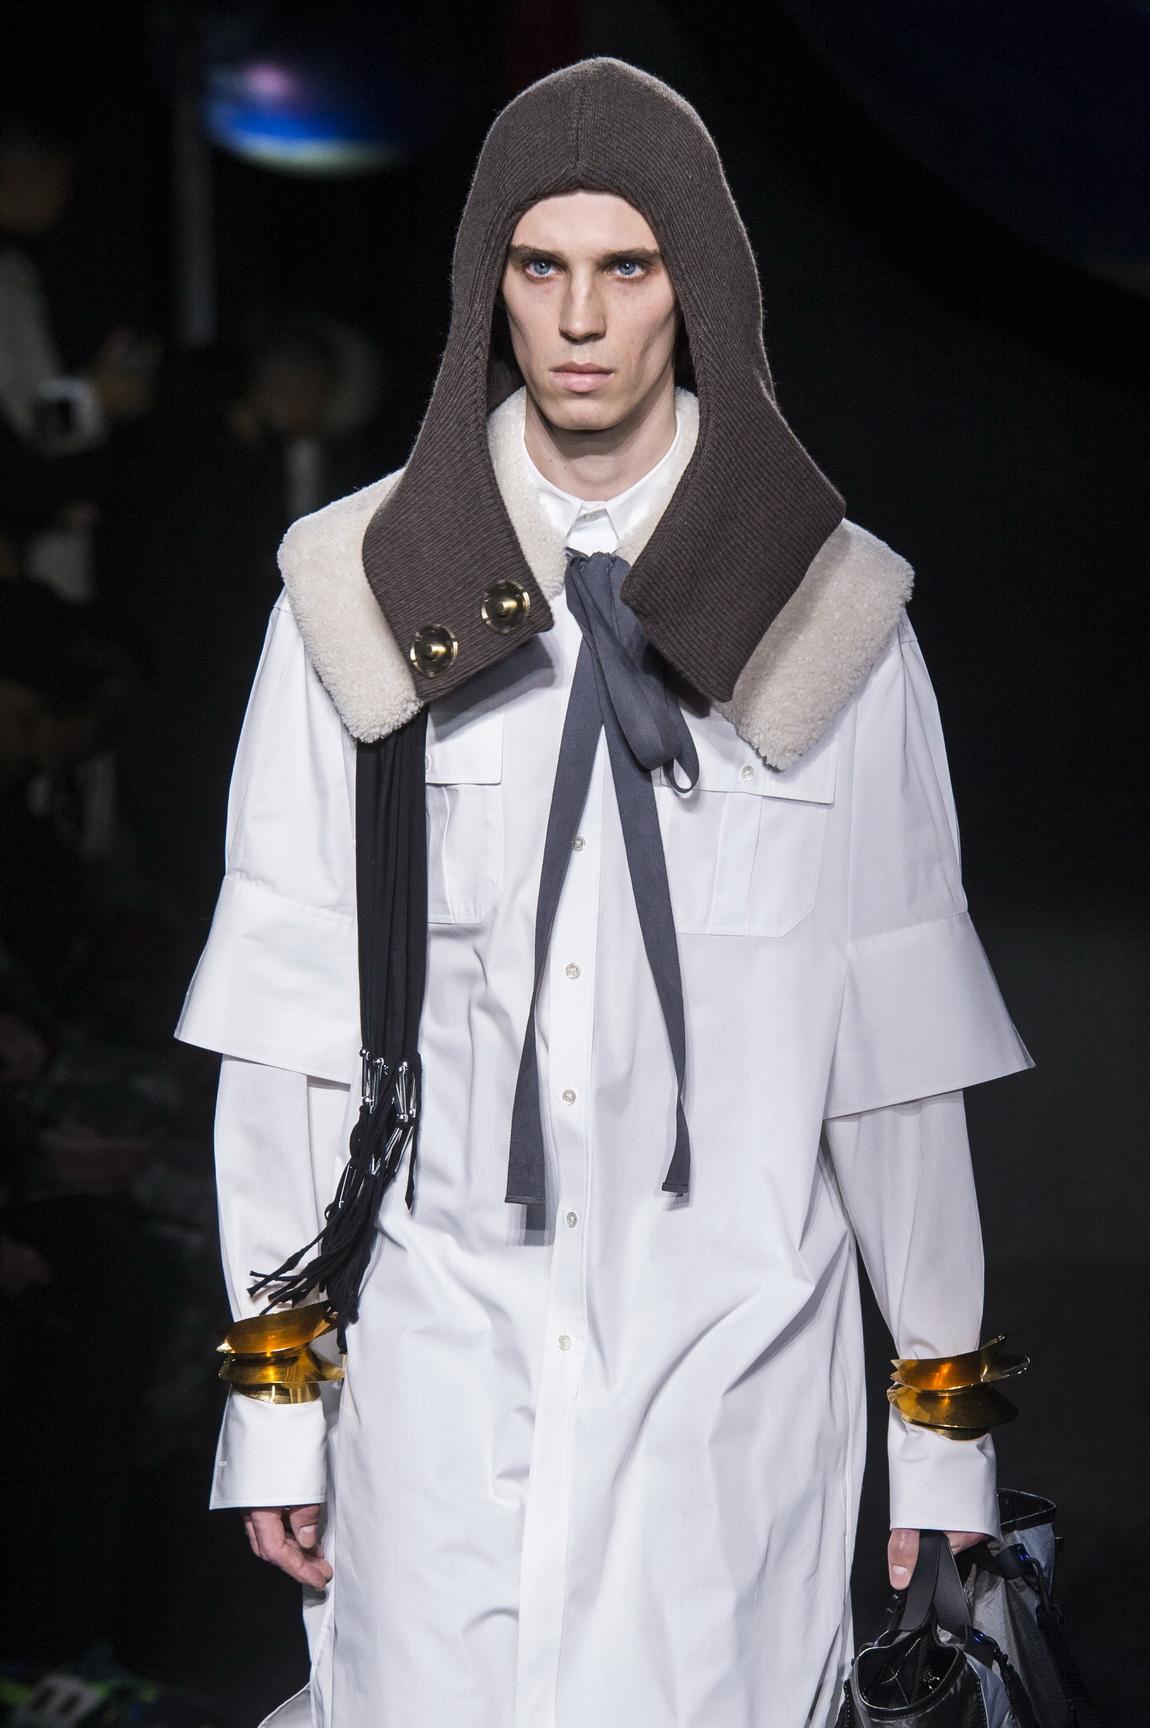 77adac1721ff The 10 breakout boys of men's fashion week